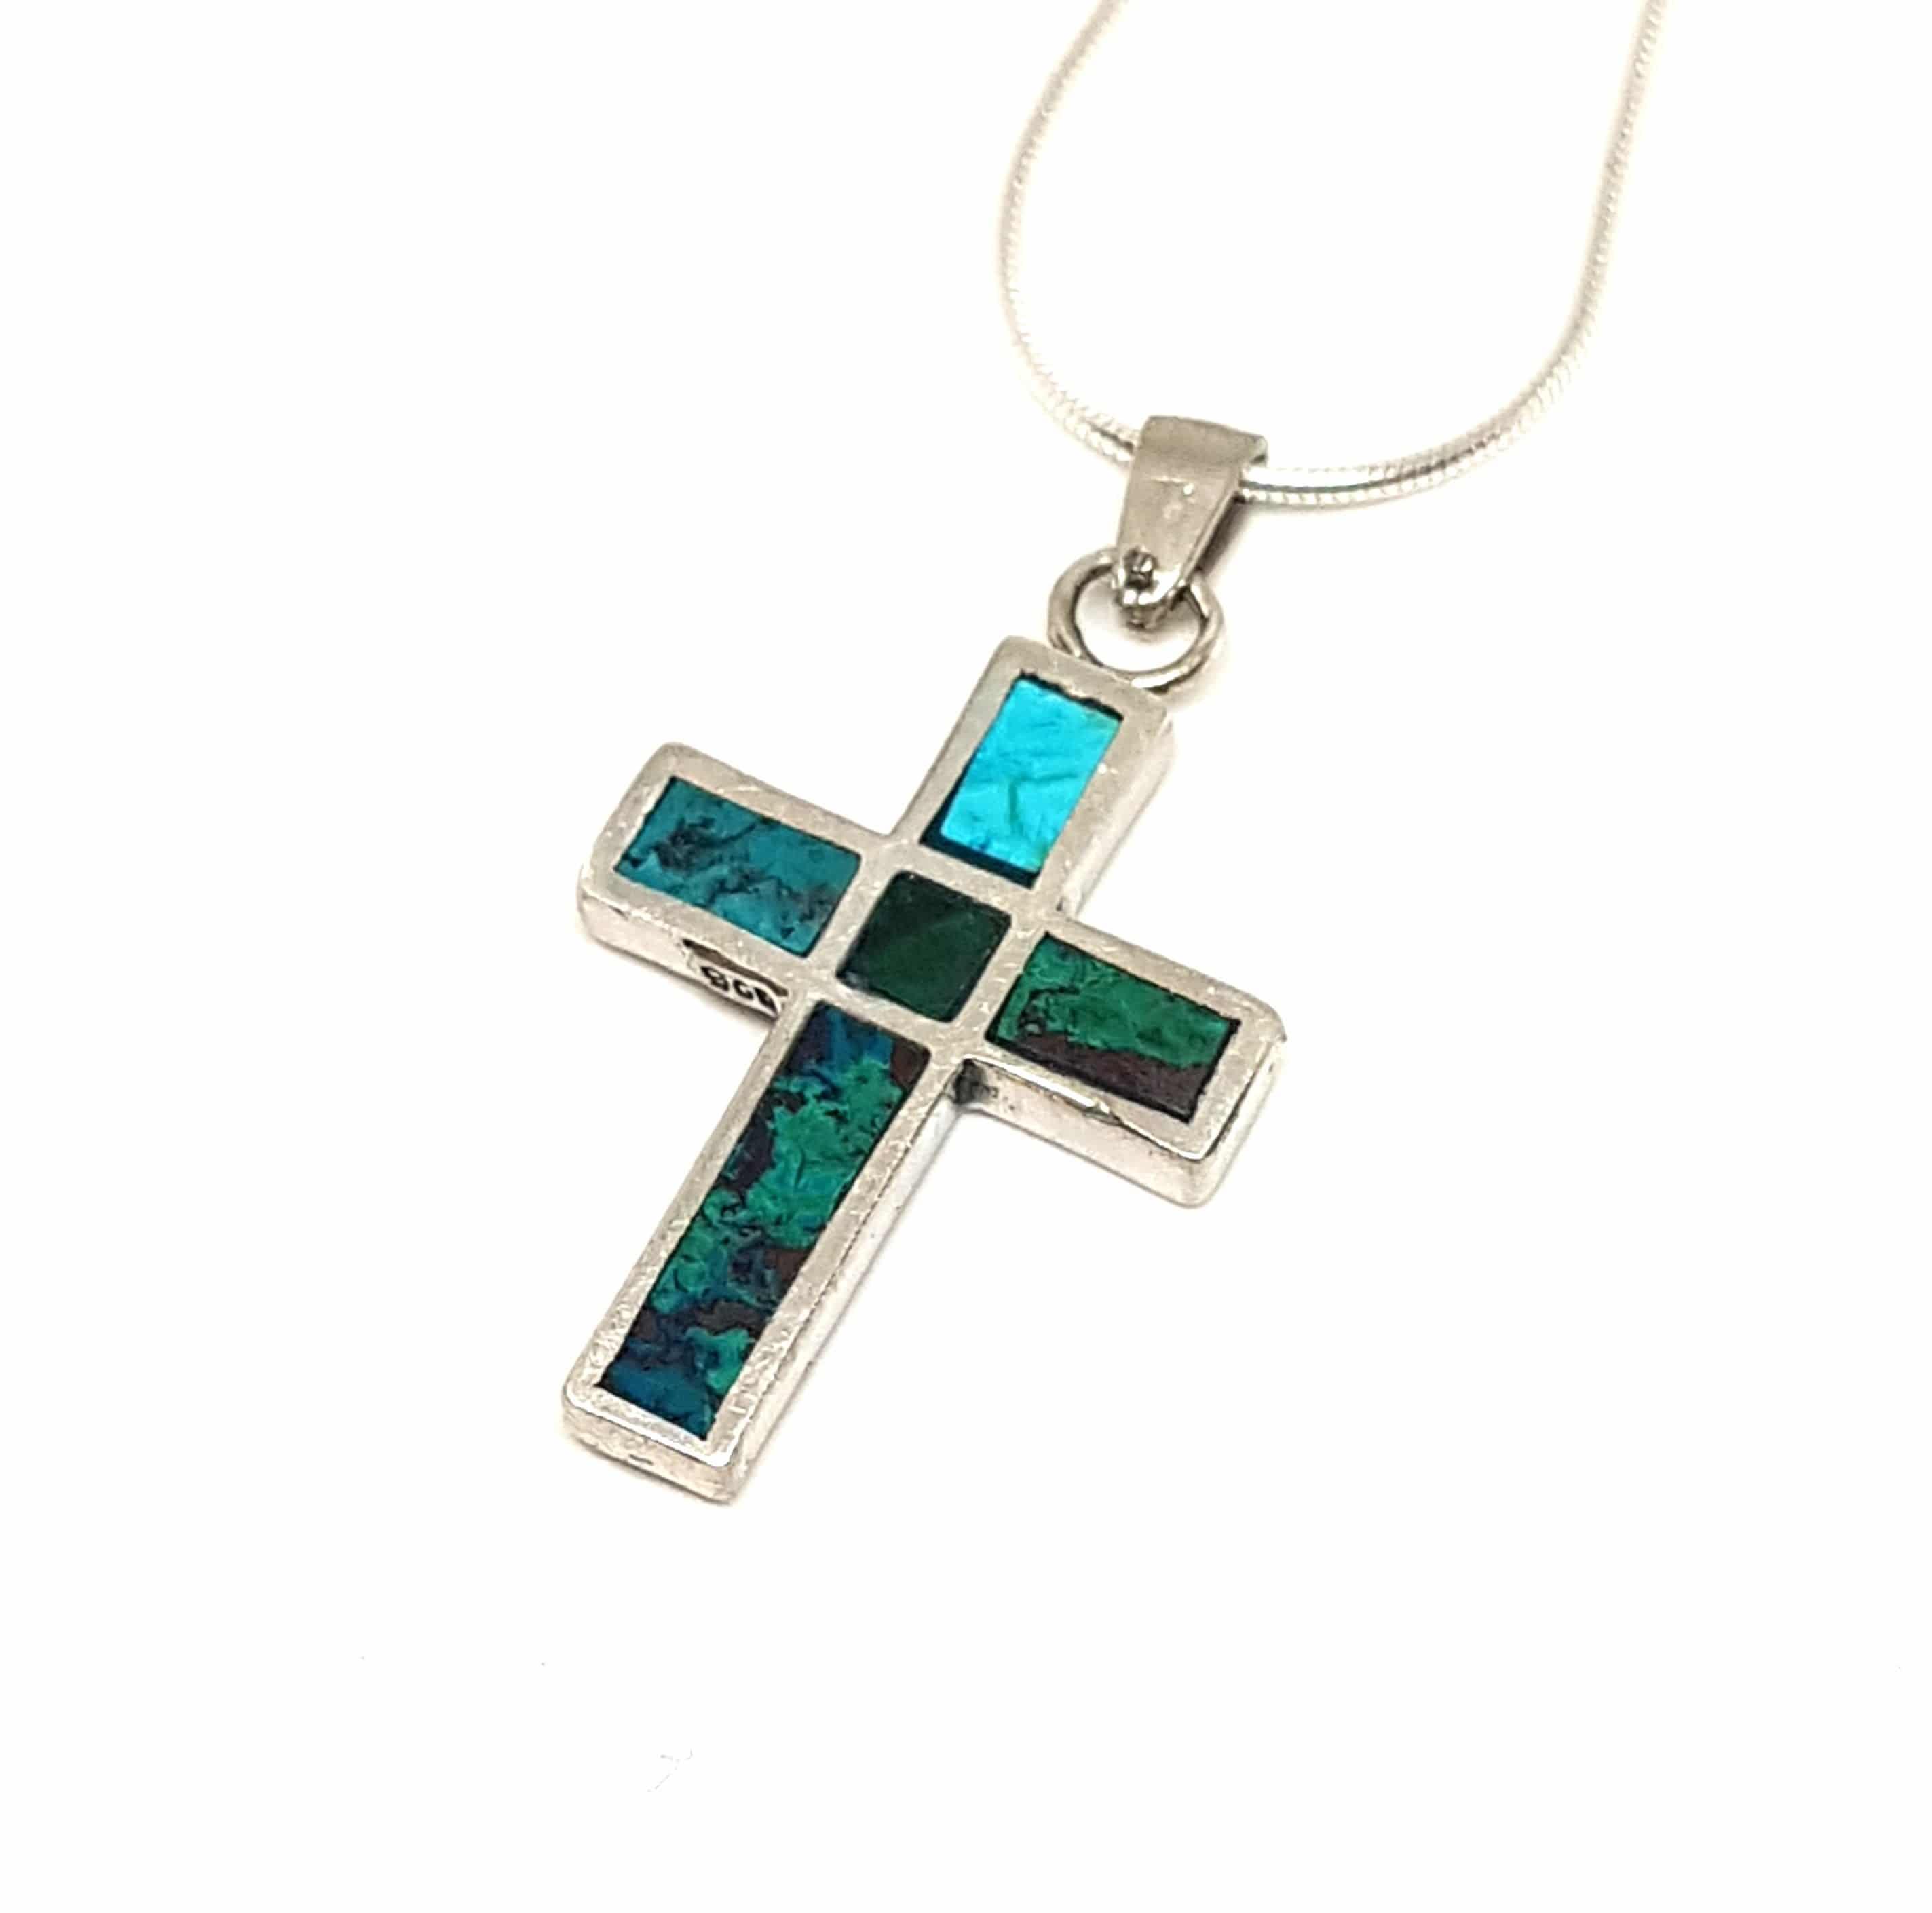 2 Sides 925 Silver Eilat Stone Cross Pendant Necklace ,Roman glass Cross Pendant